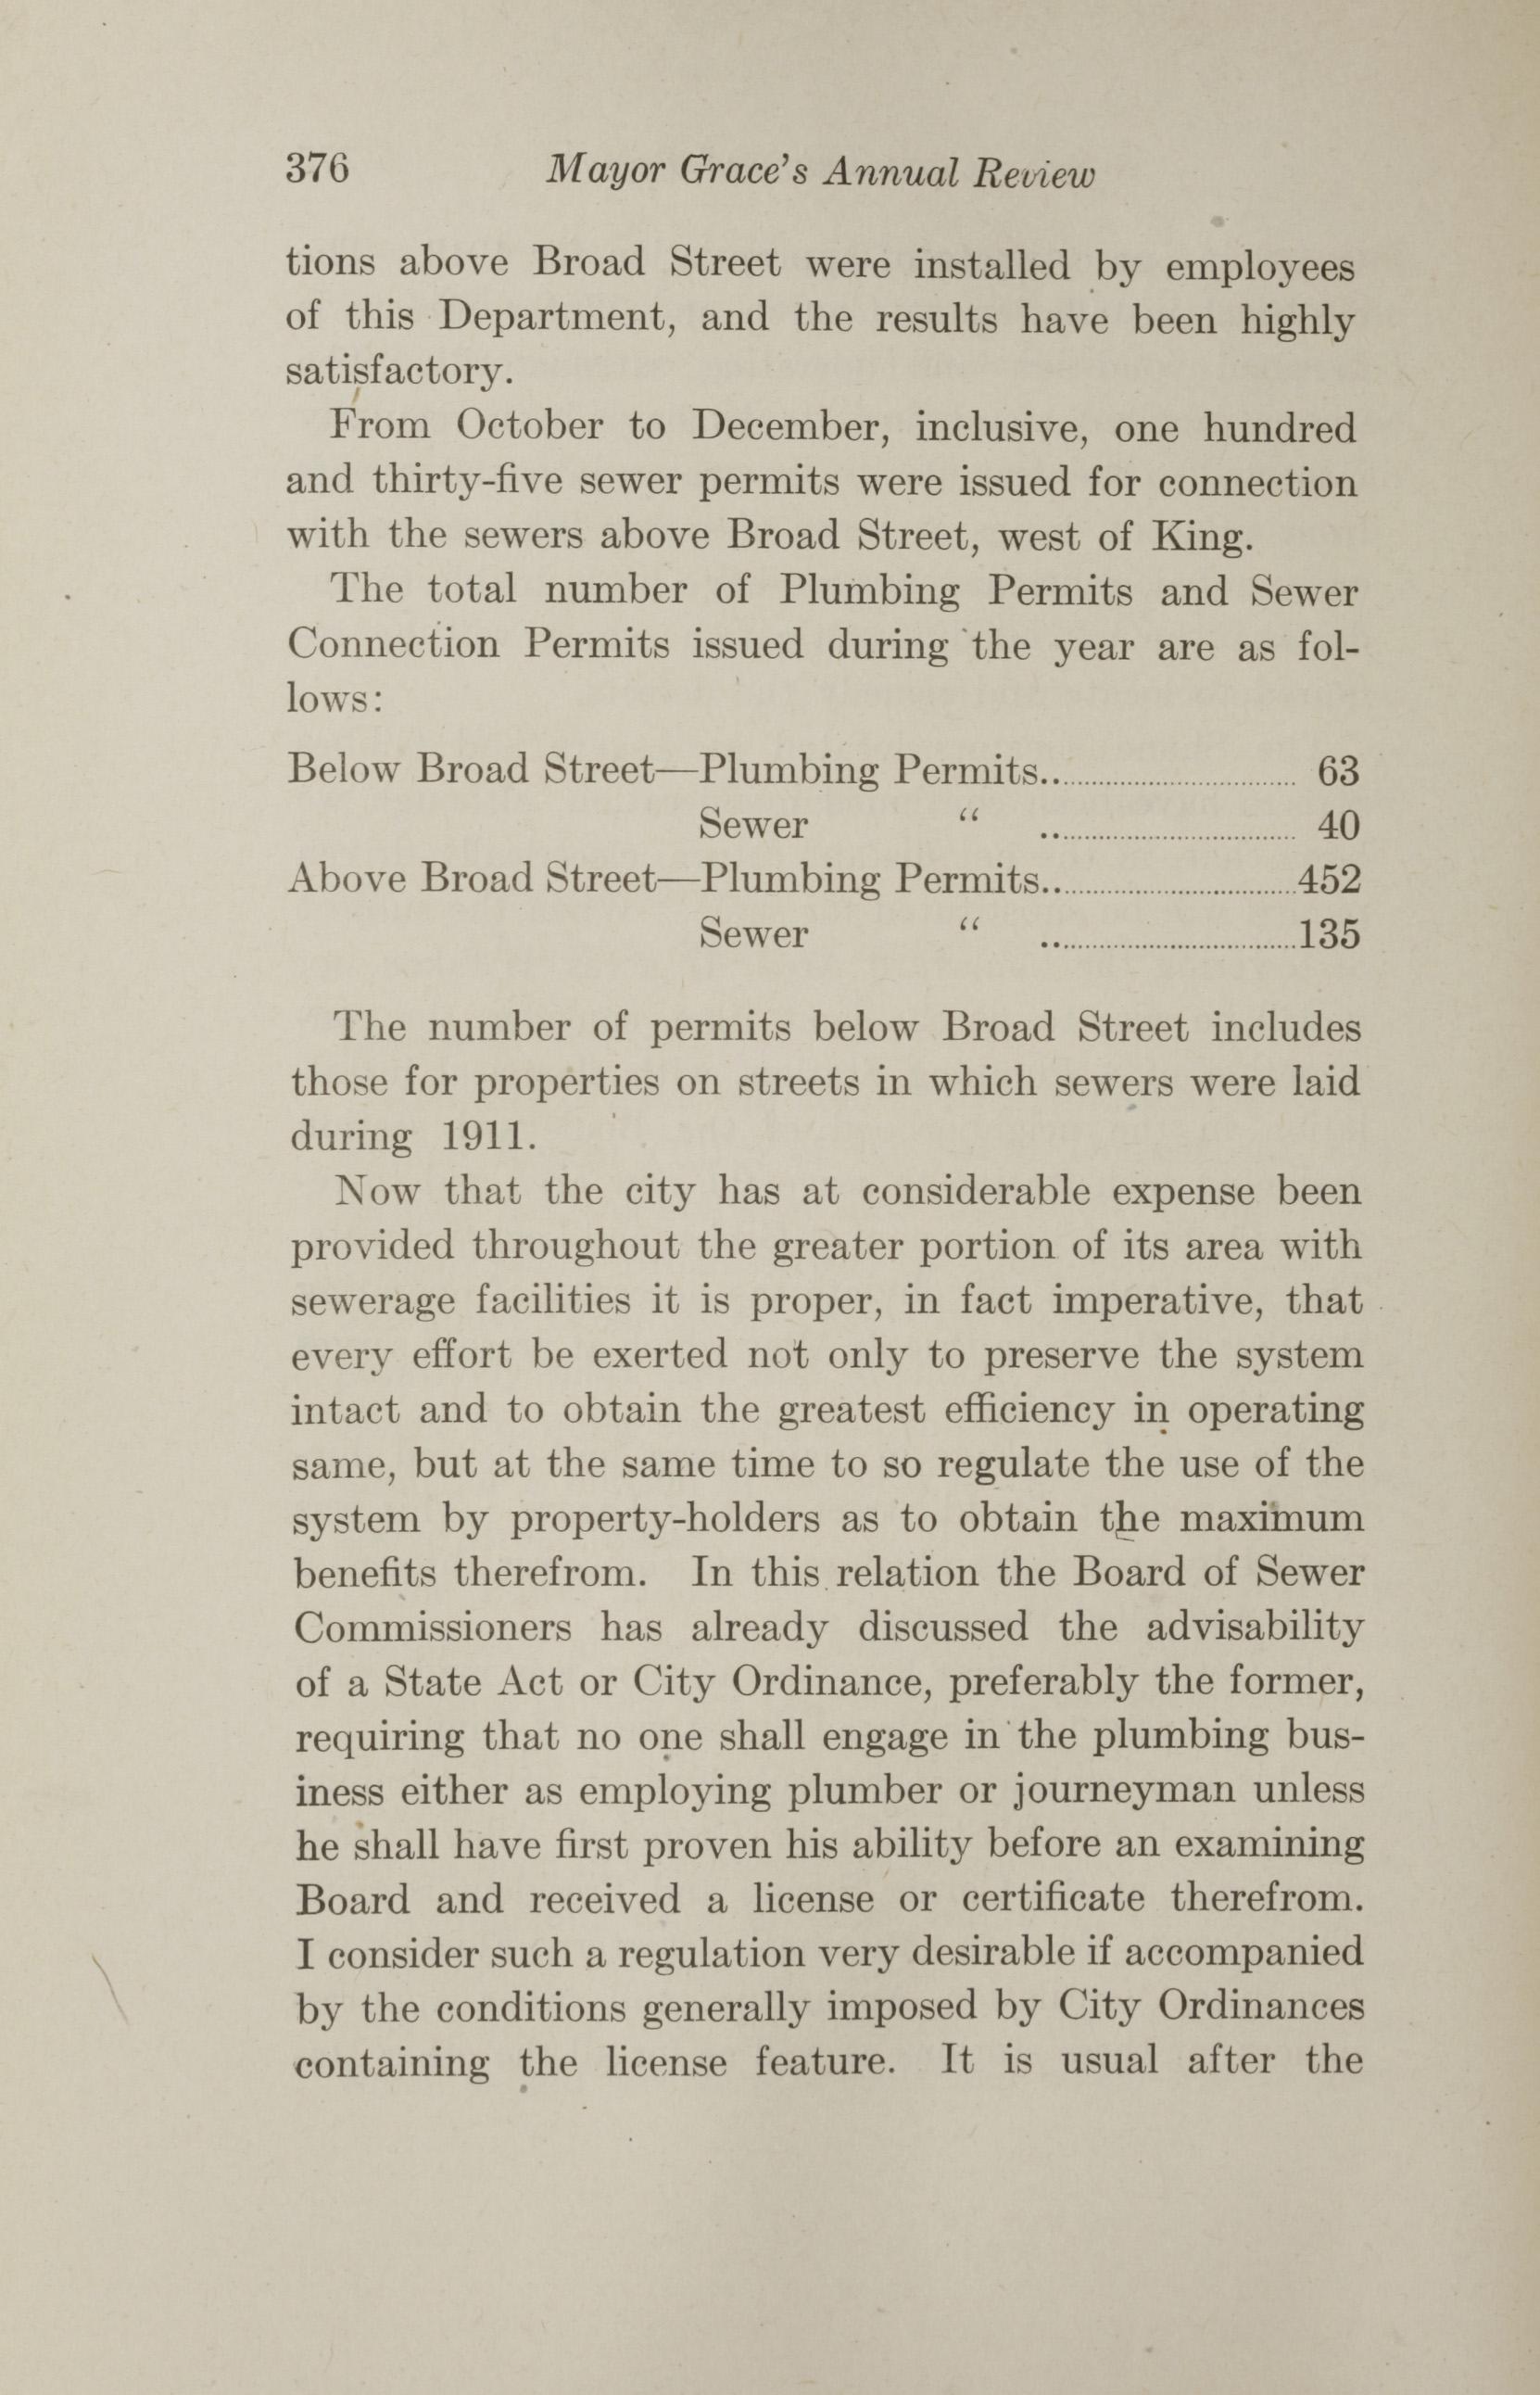 Charleston Yearbook, 1912, page 376